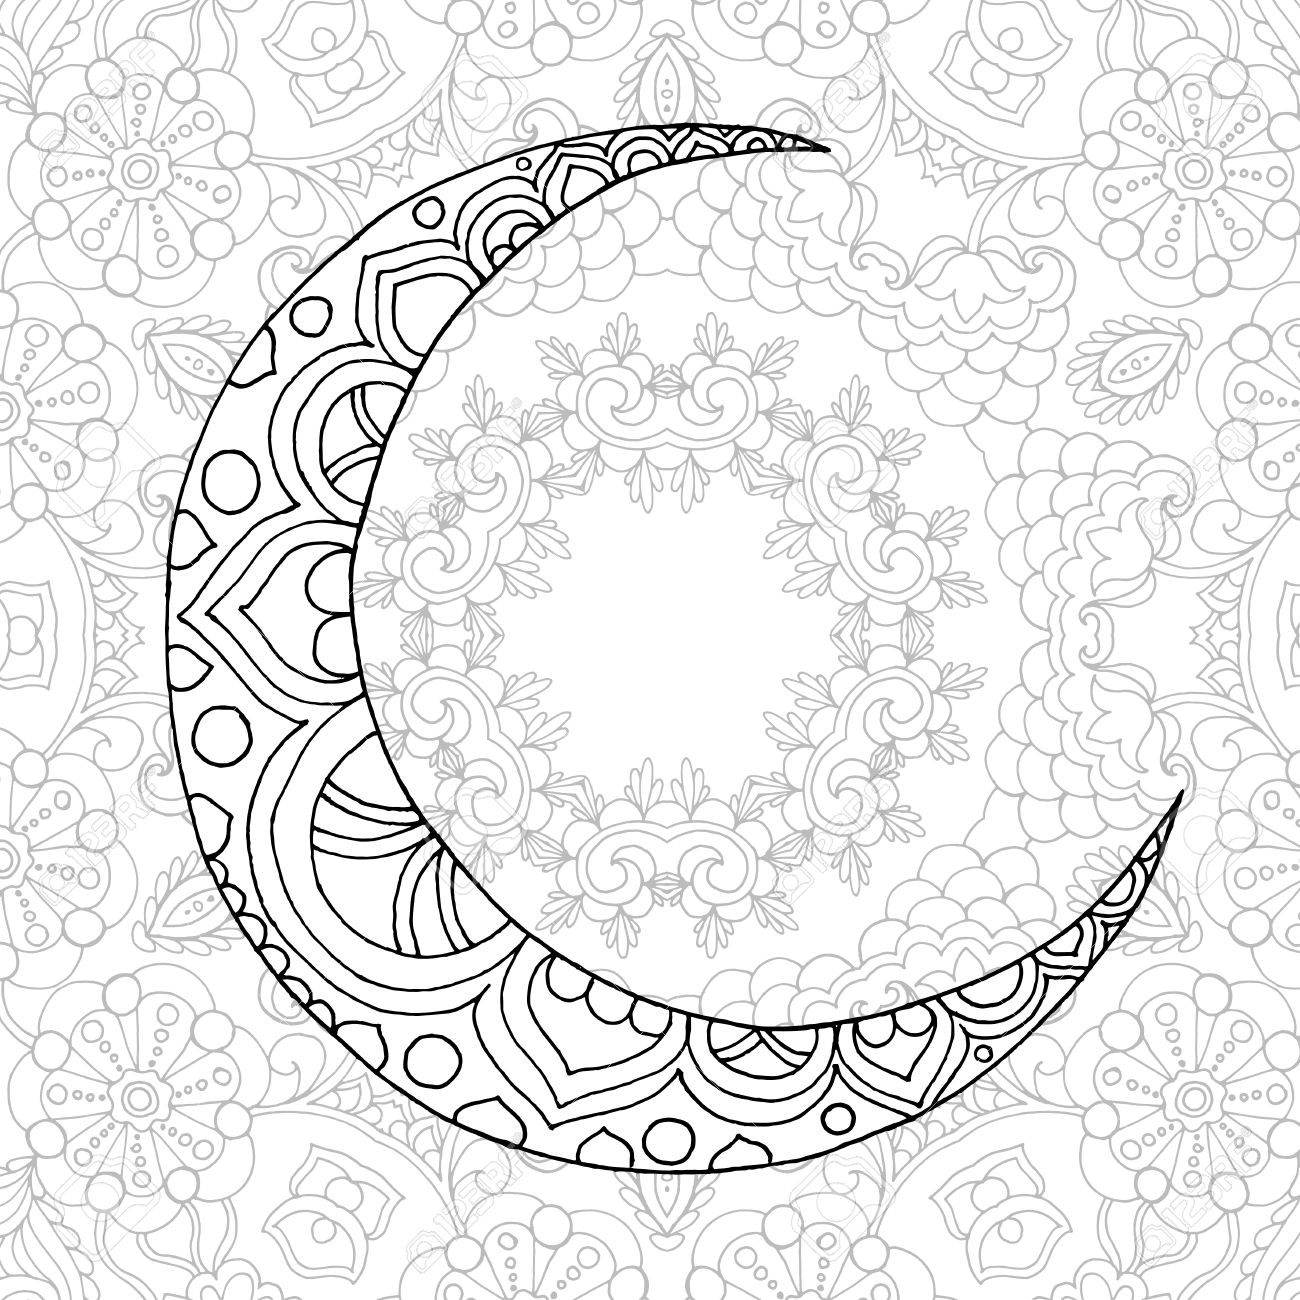 Ramadan Kareem Half Moon Greeting Design Coloring Page Engraved Royalty Free Cliparts Vectors And Stock Illustration Image 60125249